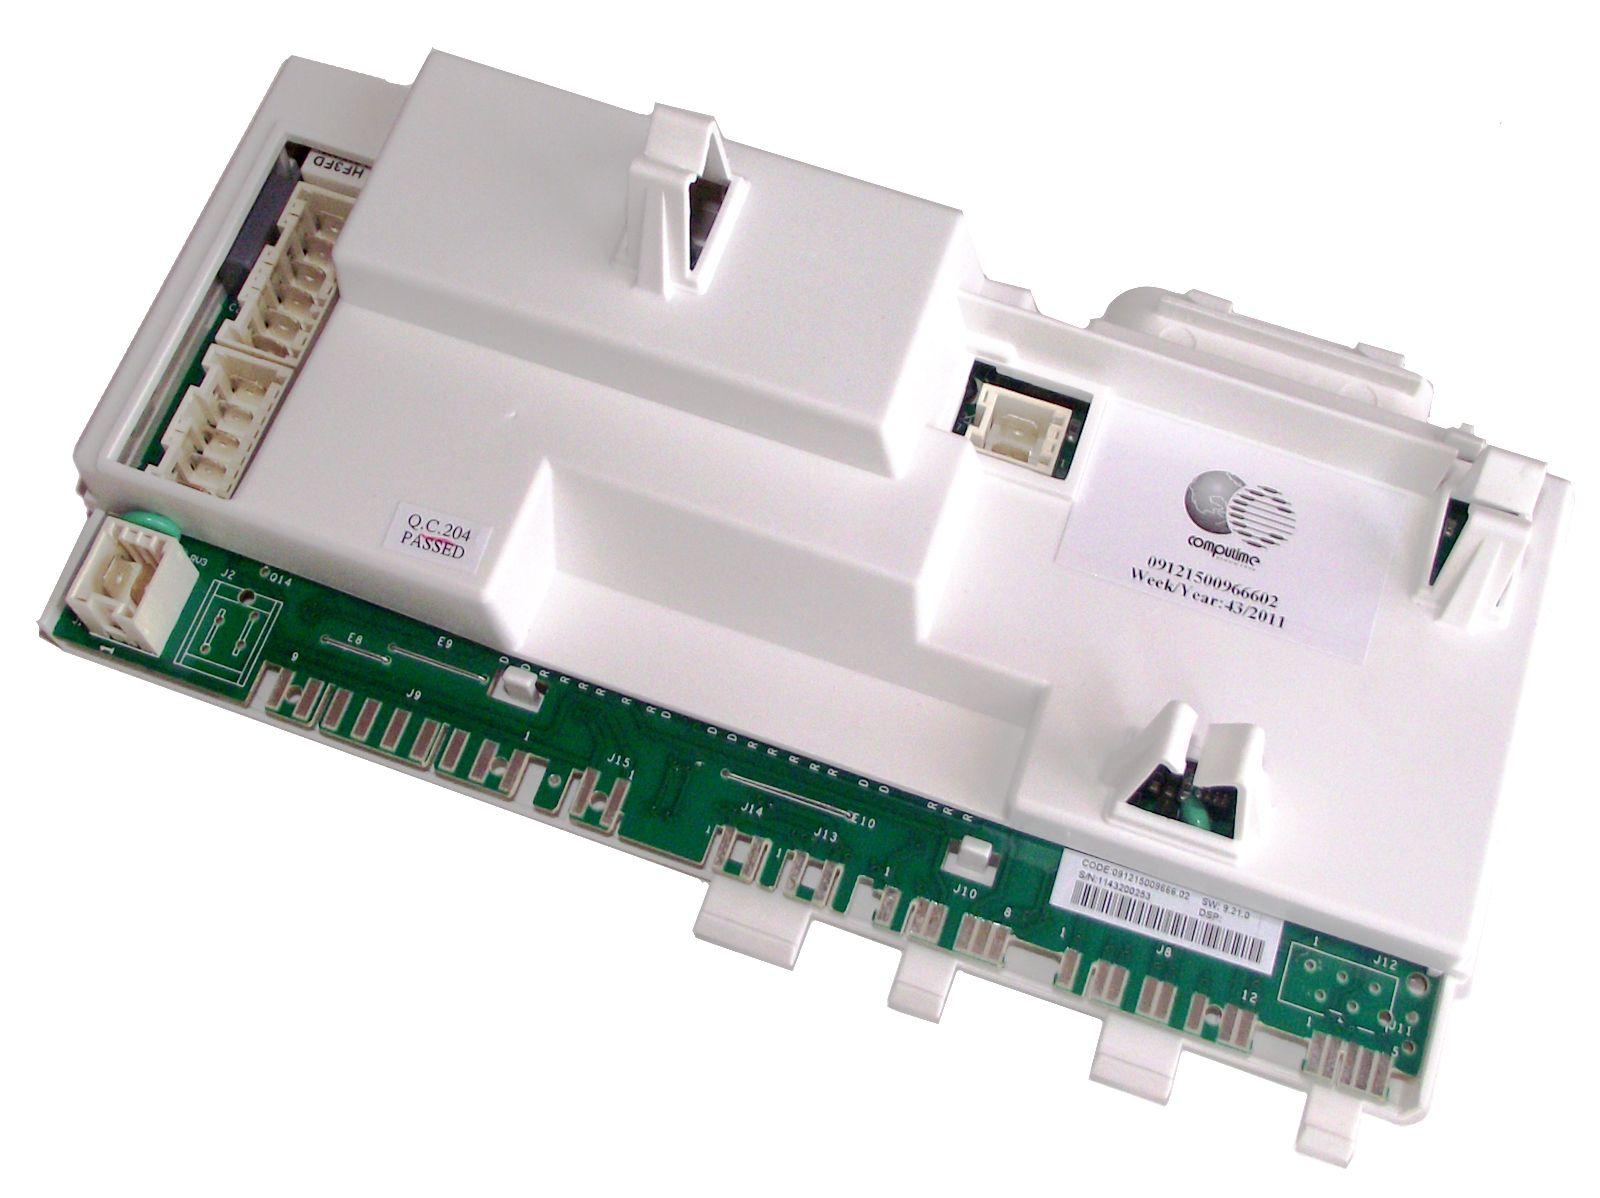 originální elektronika pračky Indesit, Ariston bez software - C00254297 Whirlpool / Indesit